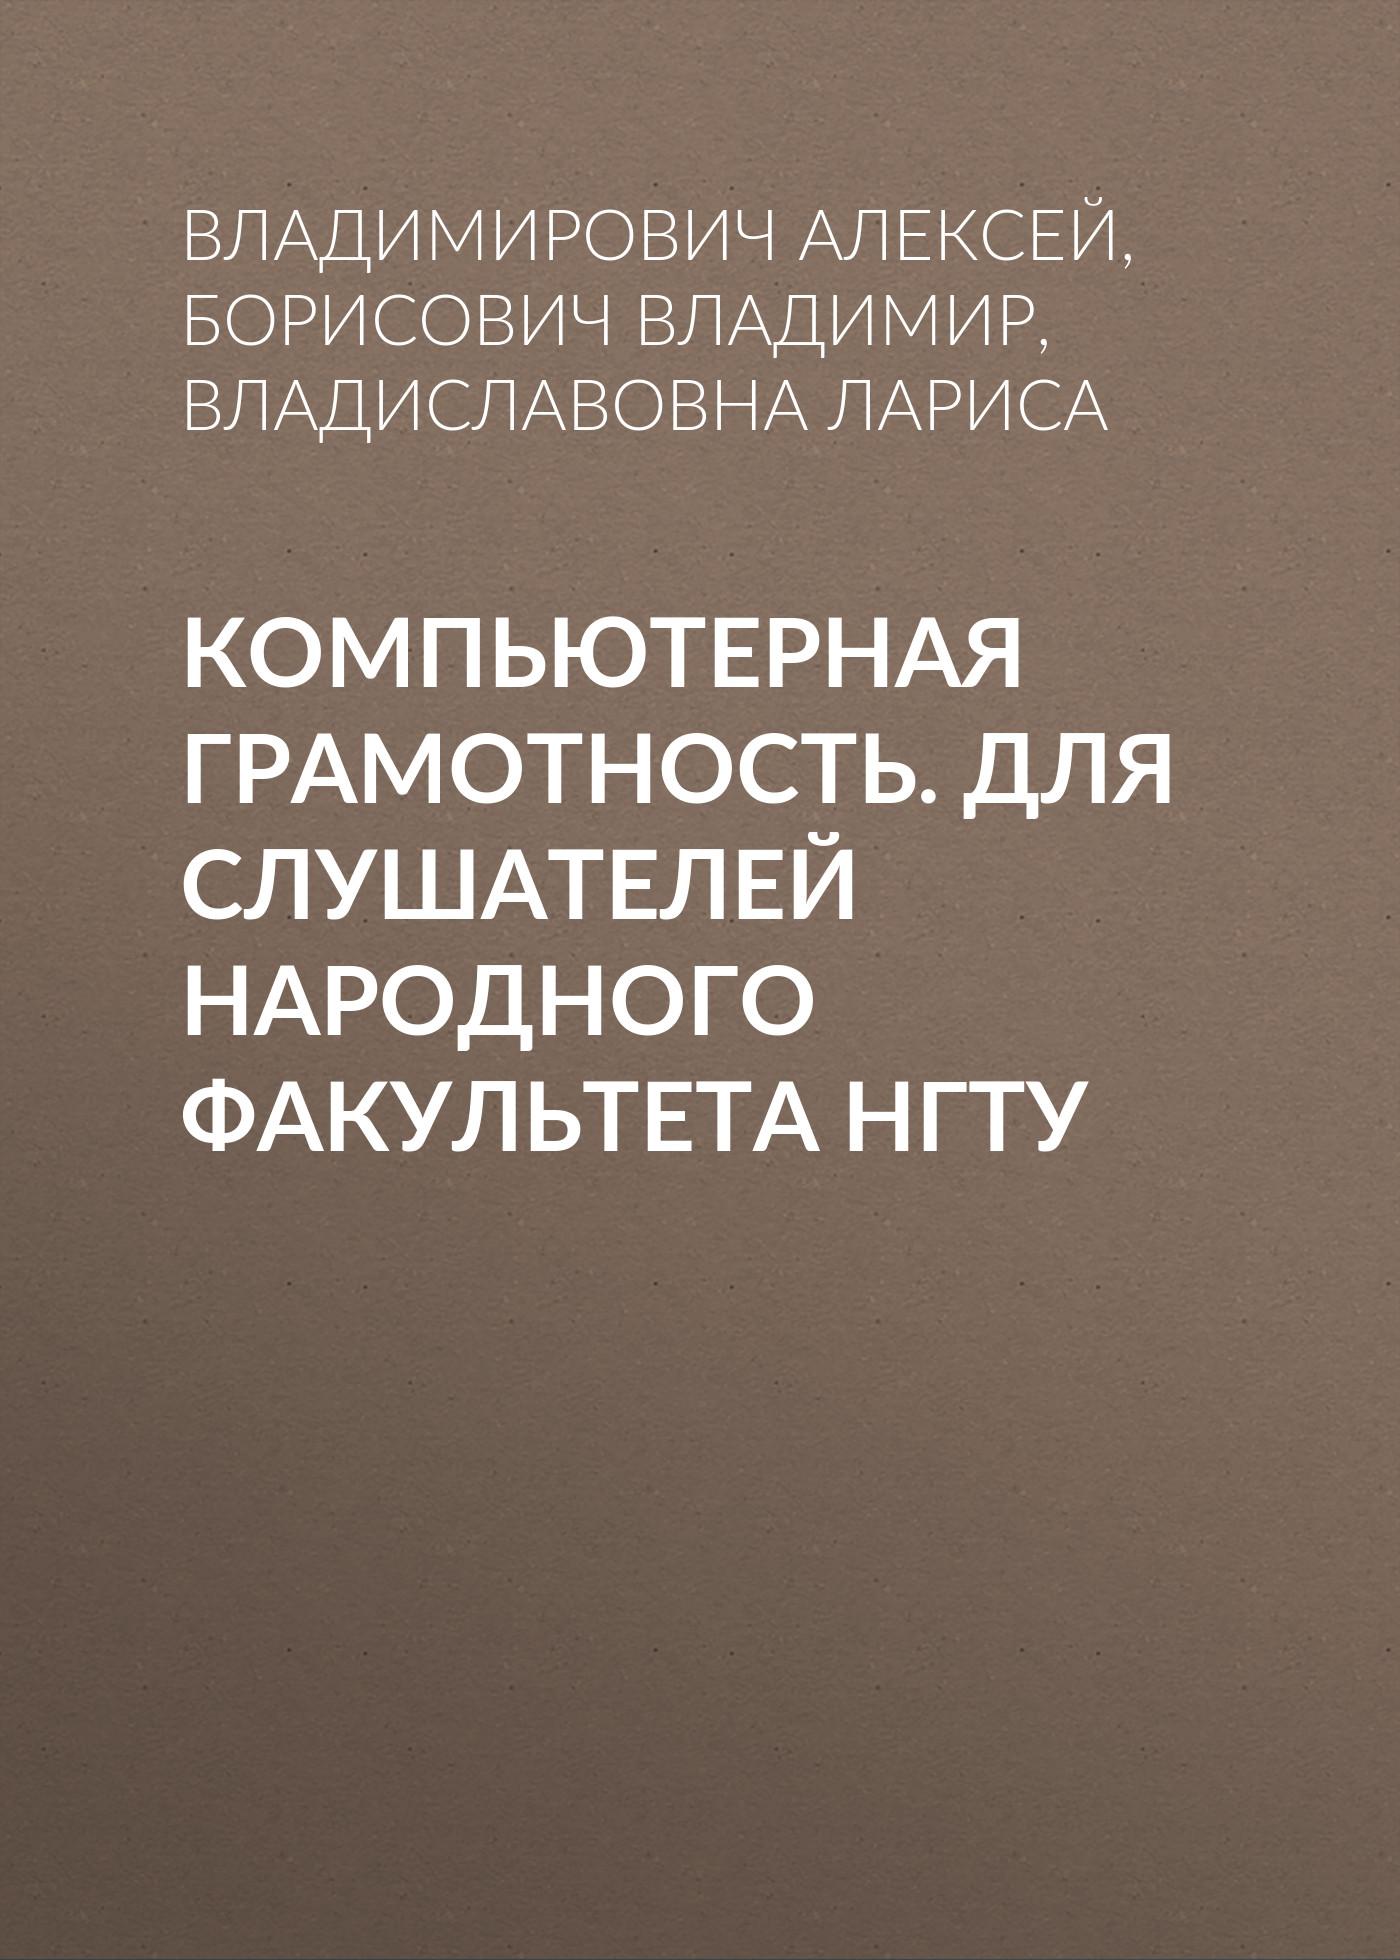 Л. В. Прохорова Компьютерная грамотность. Для слушателей Народного факультета НГТУ зк кпп great wall coolbear 2008 2015 florid 2008 2013 toyota bb fwd 2000 2005 echo fwd 2000 2005 st 2mm